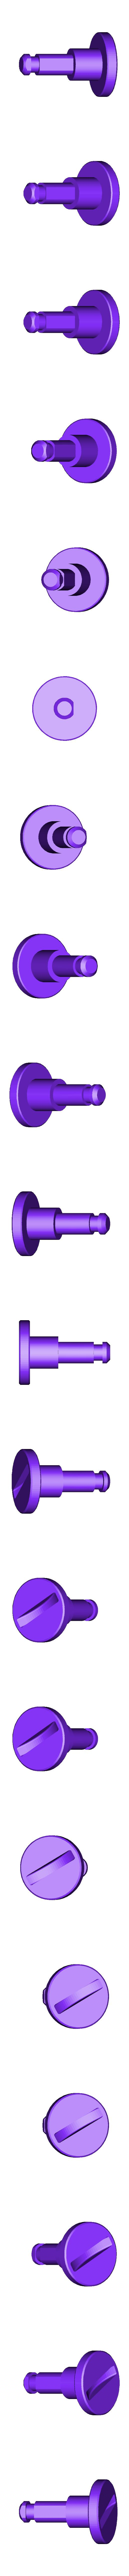 Level_Mech_1.stl Download free STL file Oculus Rift DK2 • 3D printing object, indigo4